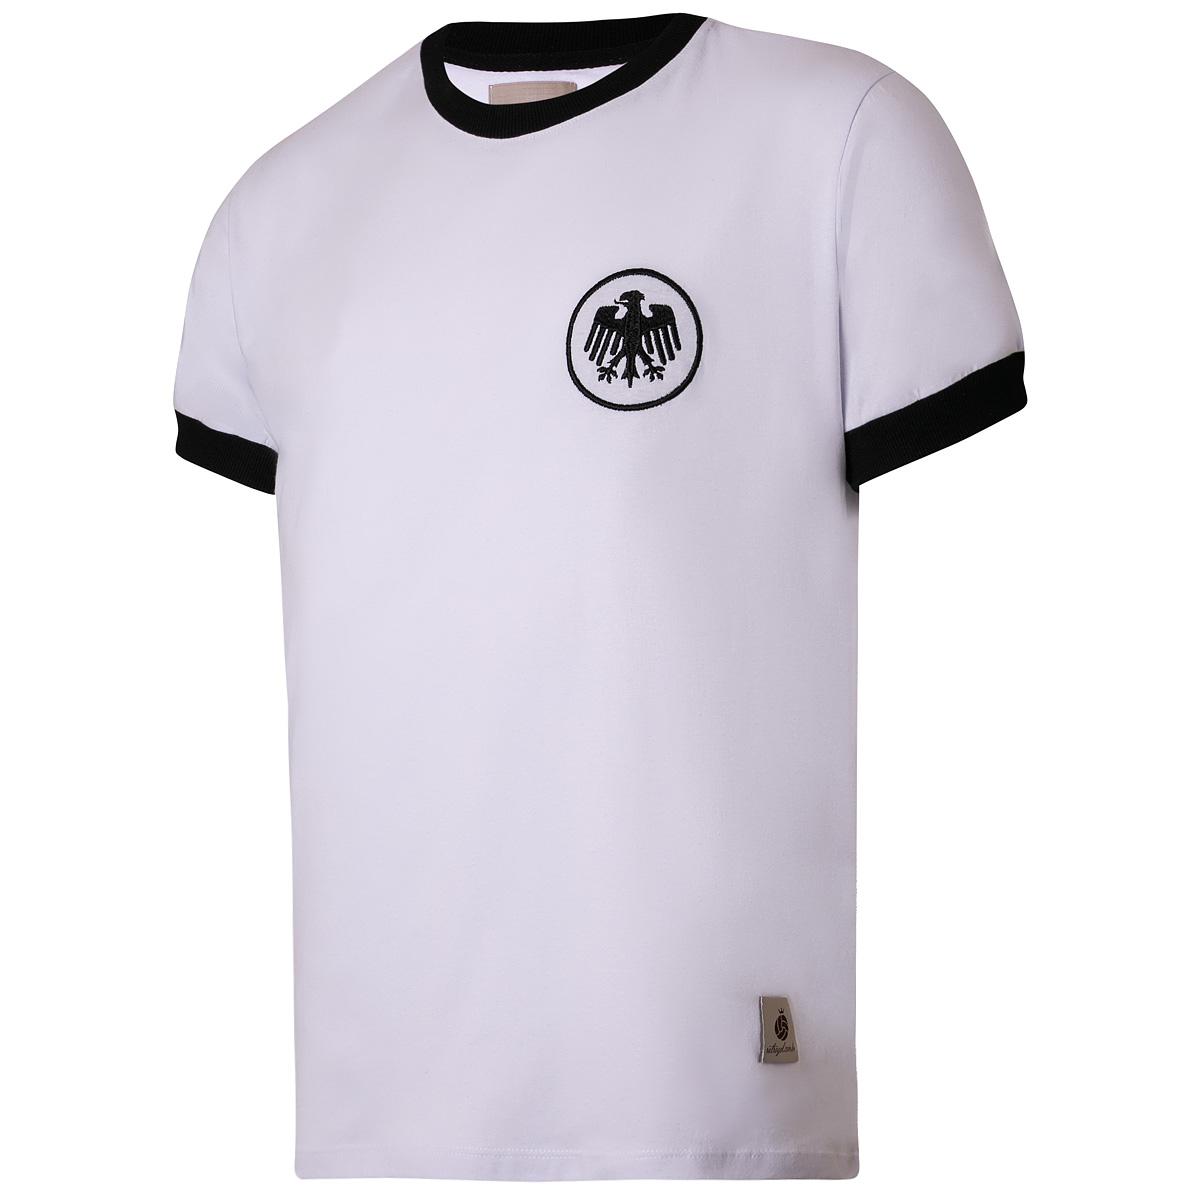 Camisa Alemanha Retrô 1974 Masculina